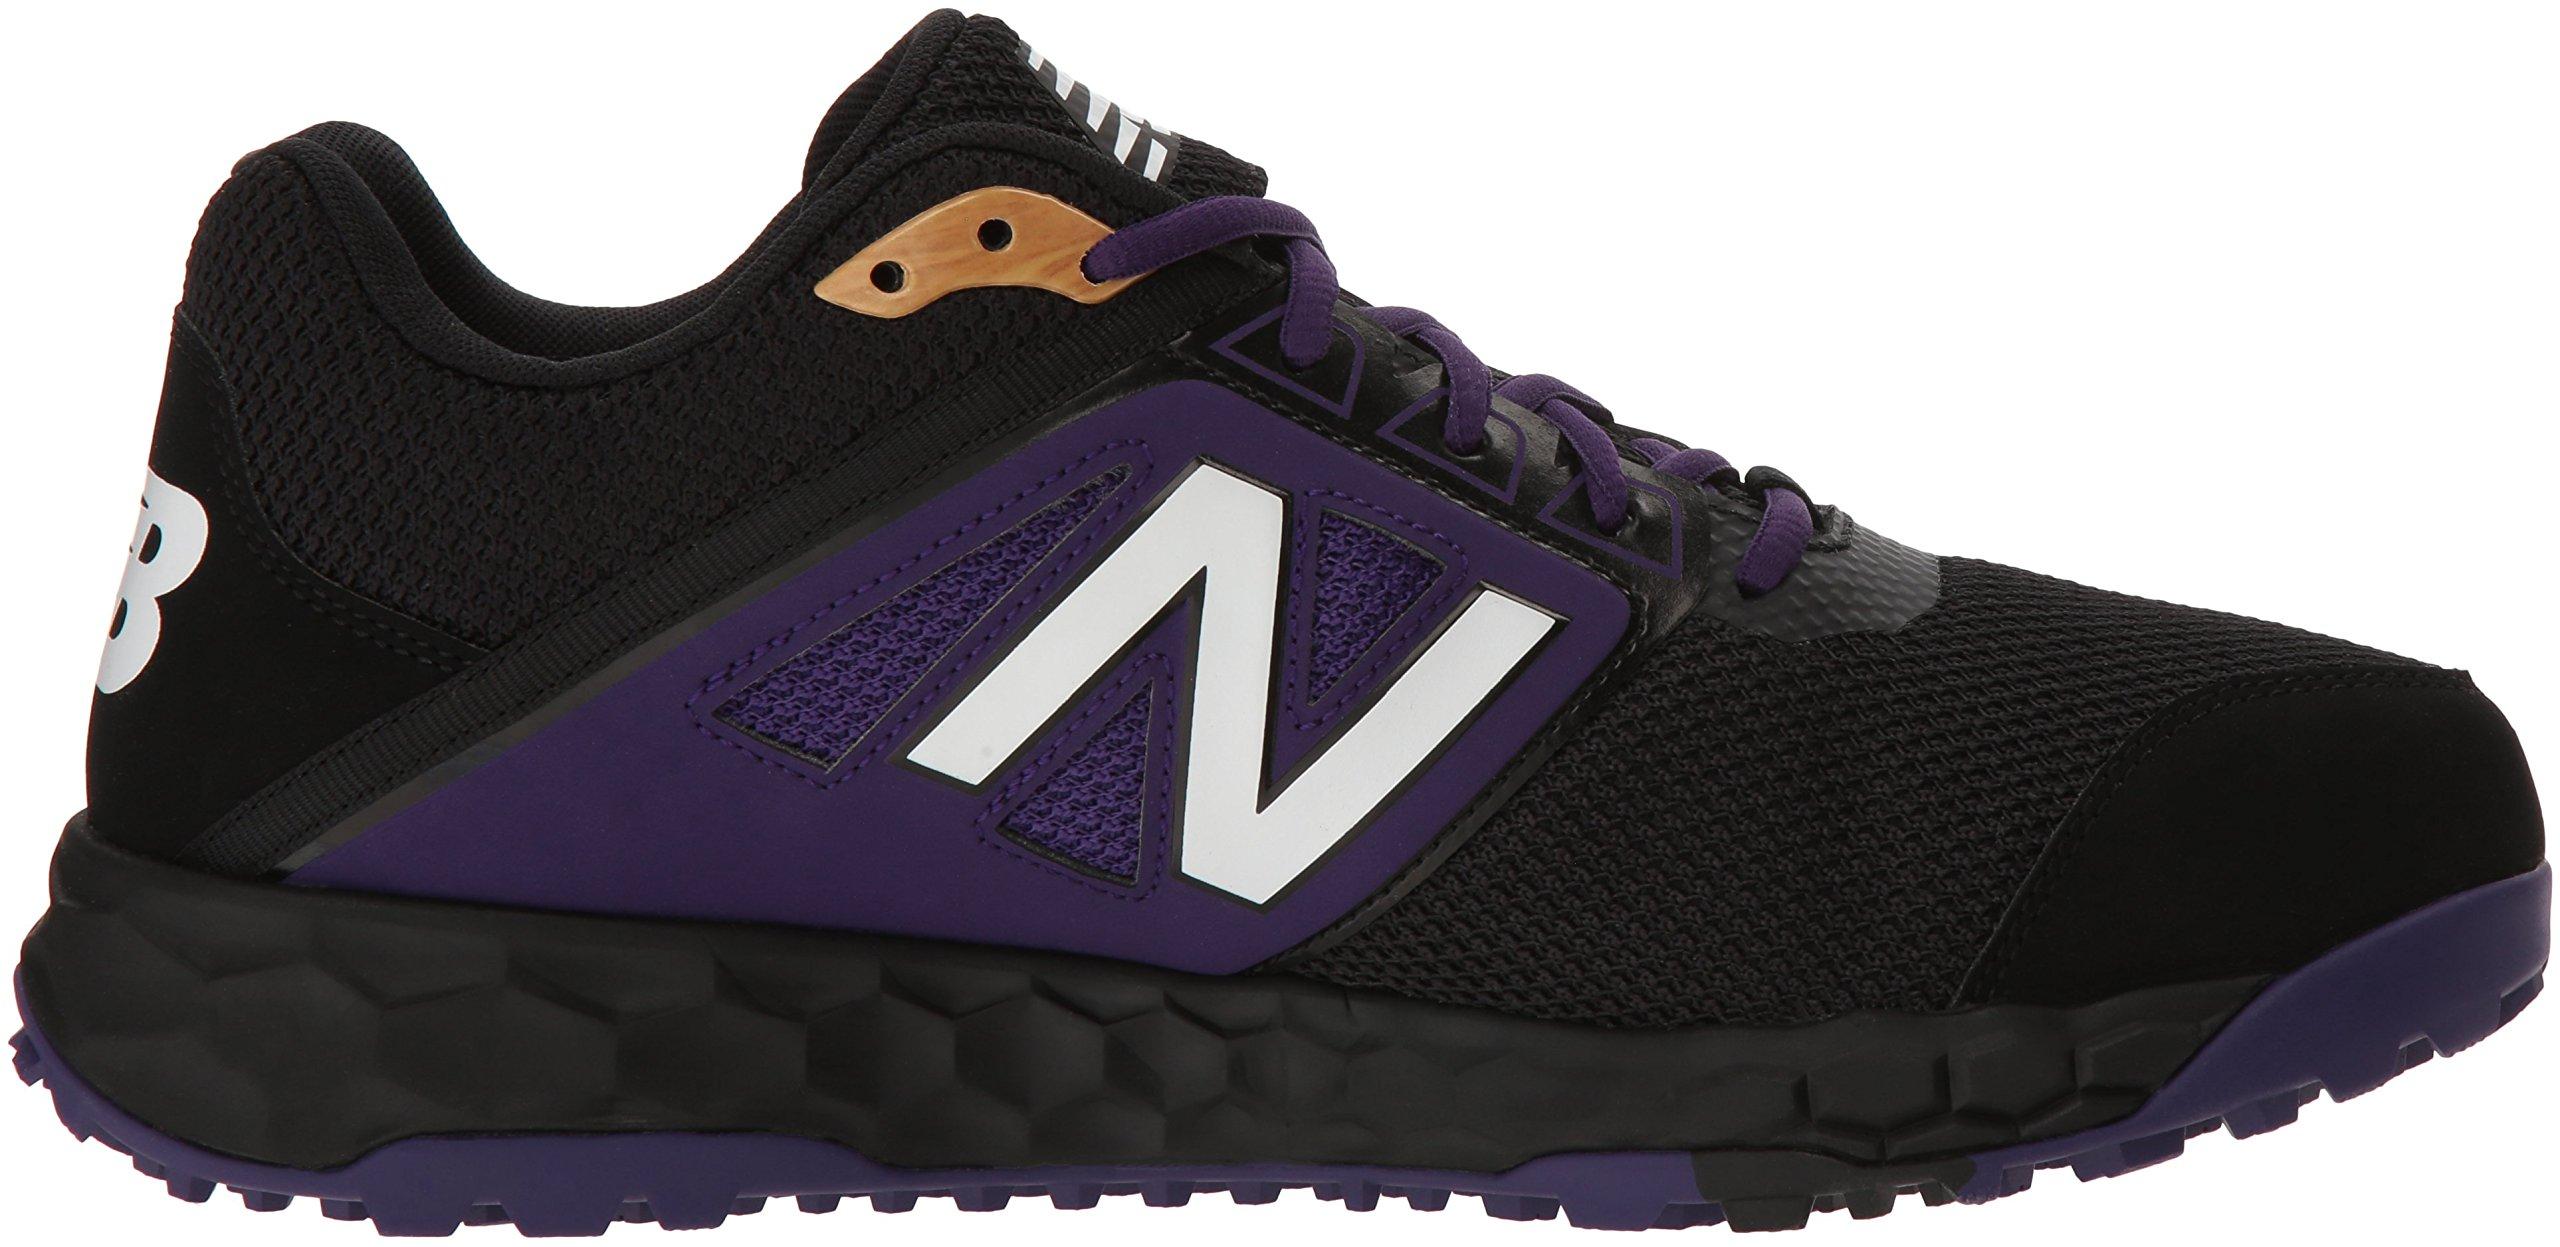 New Balance Men's 3000v4 Turf Baseball Shoe, Black/Purple, 5 D US by New Balance (Image #6)